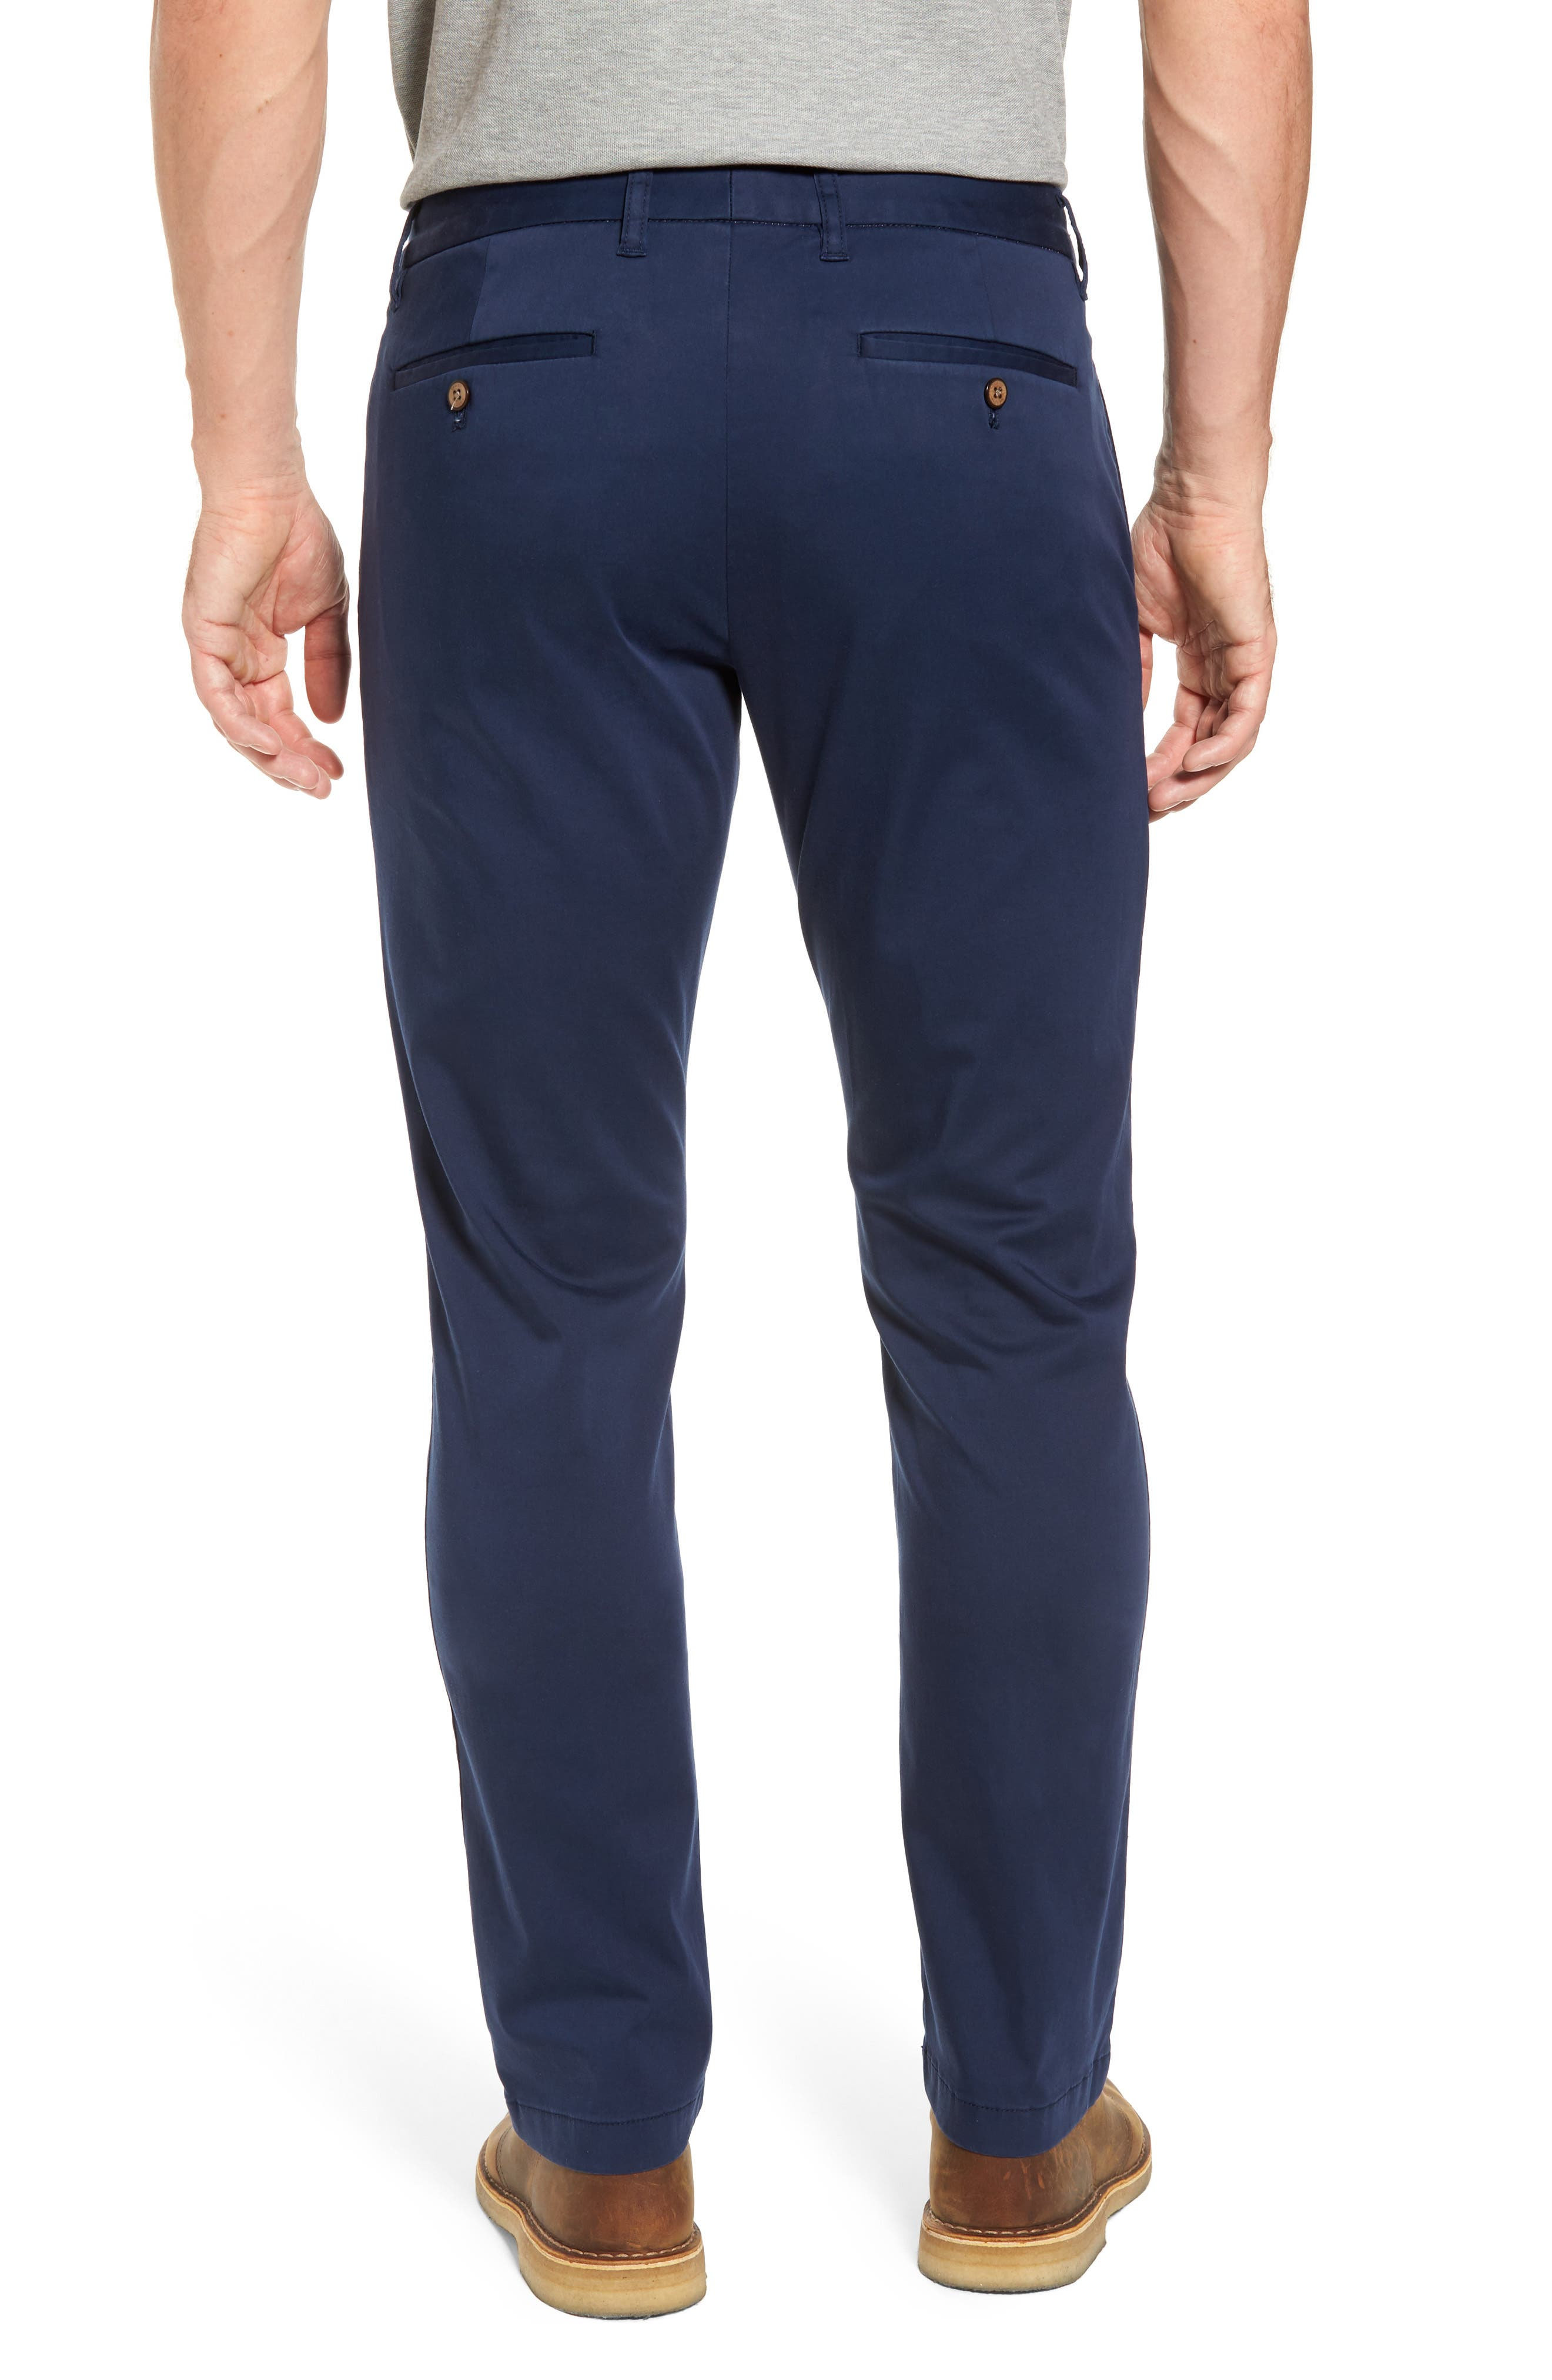 Boracay Flat Front Pants,                             Alternate thumbnail 2, color,                             Maritime